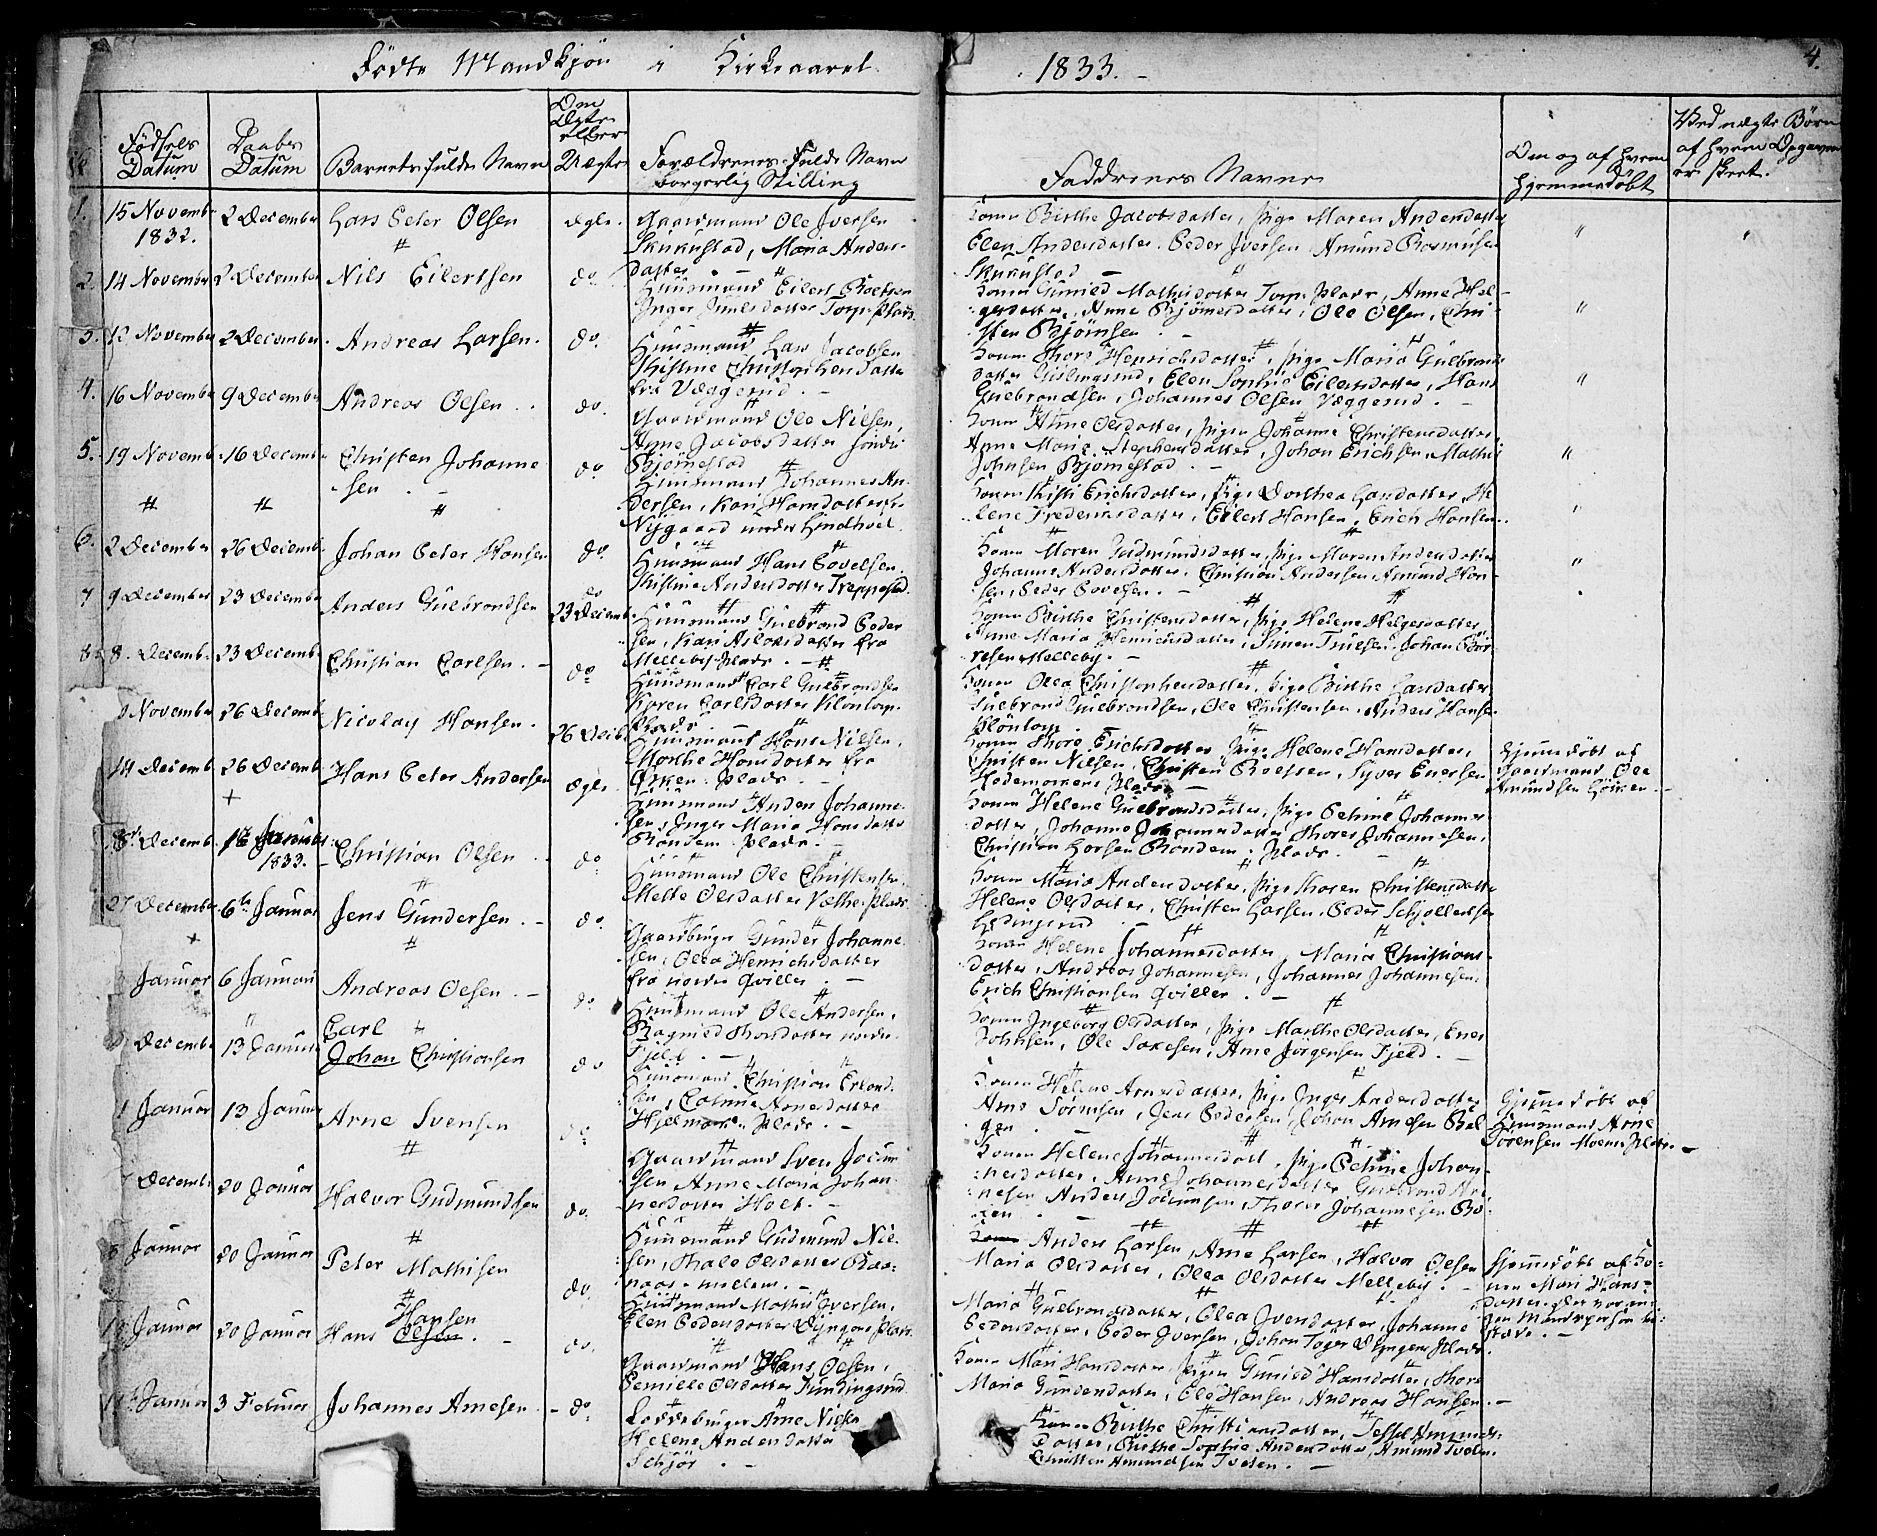 SAO, Eidsberg prestekontor Kirkebøker, F/Fa/L0008: Ministerialbok nr. I 8, 1832-1848, s. 4